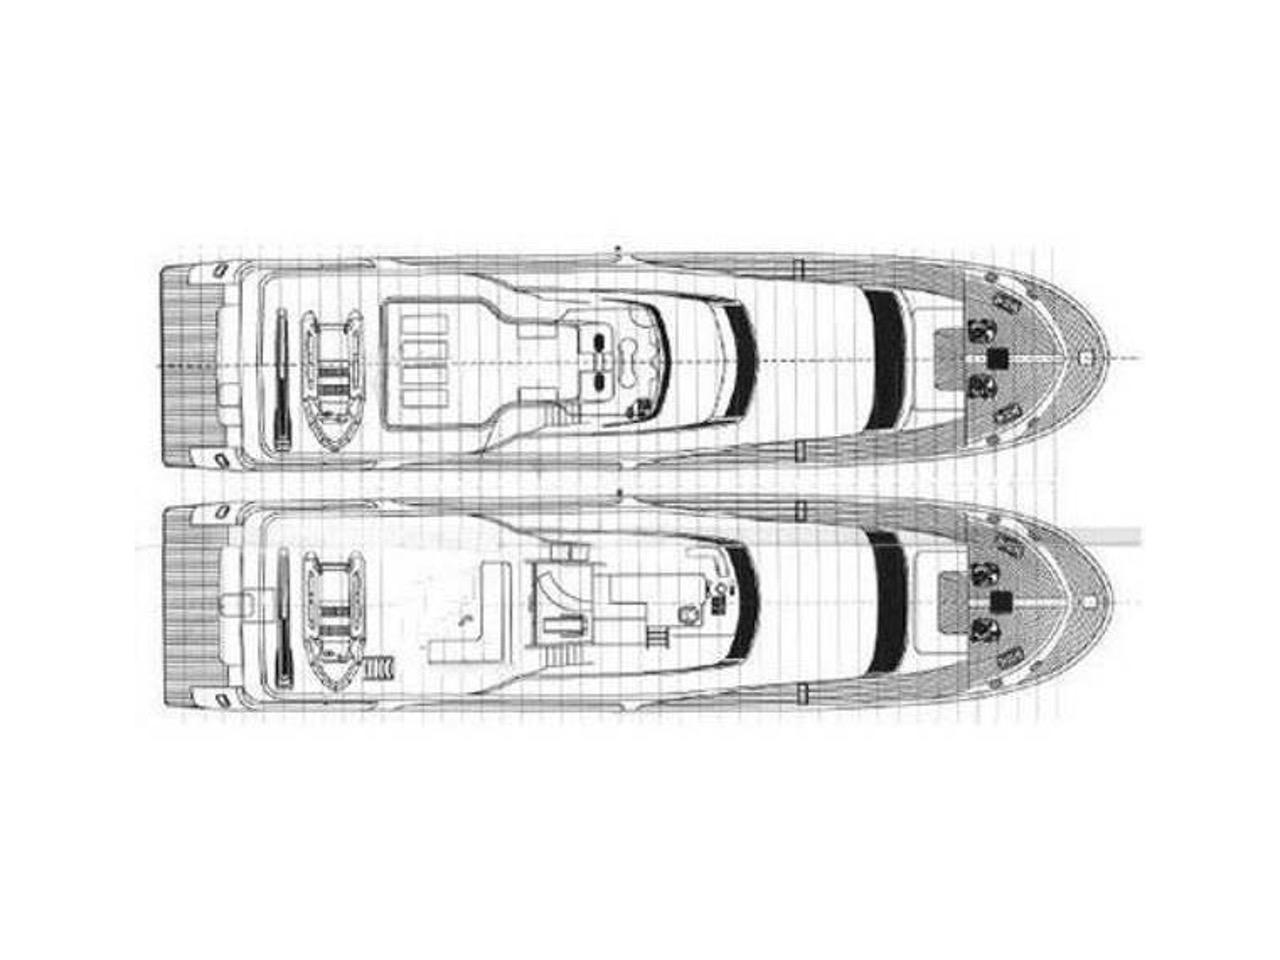 Mengi-Yay-31-Yacht-4